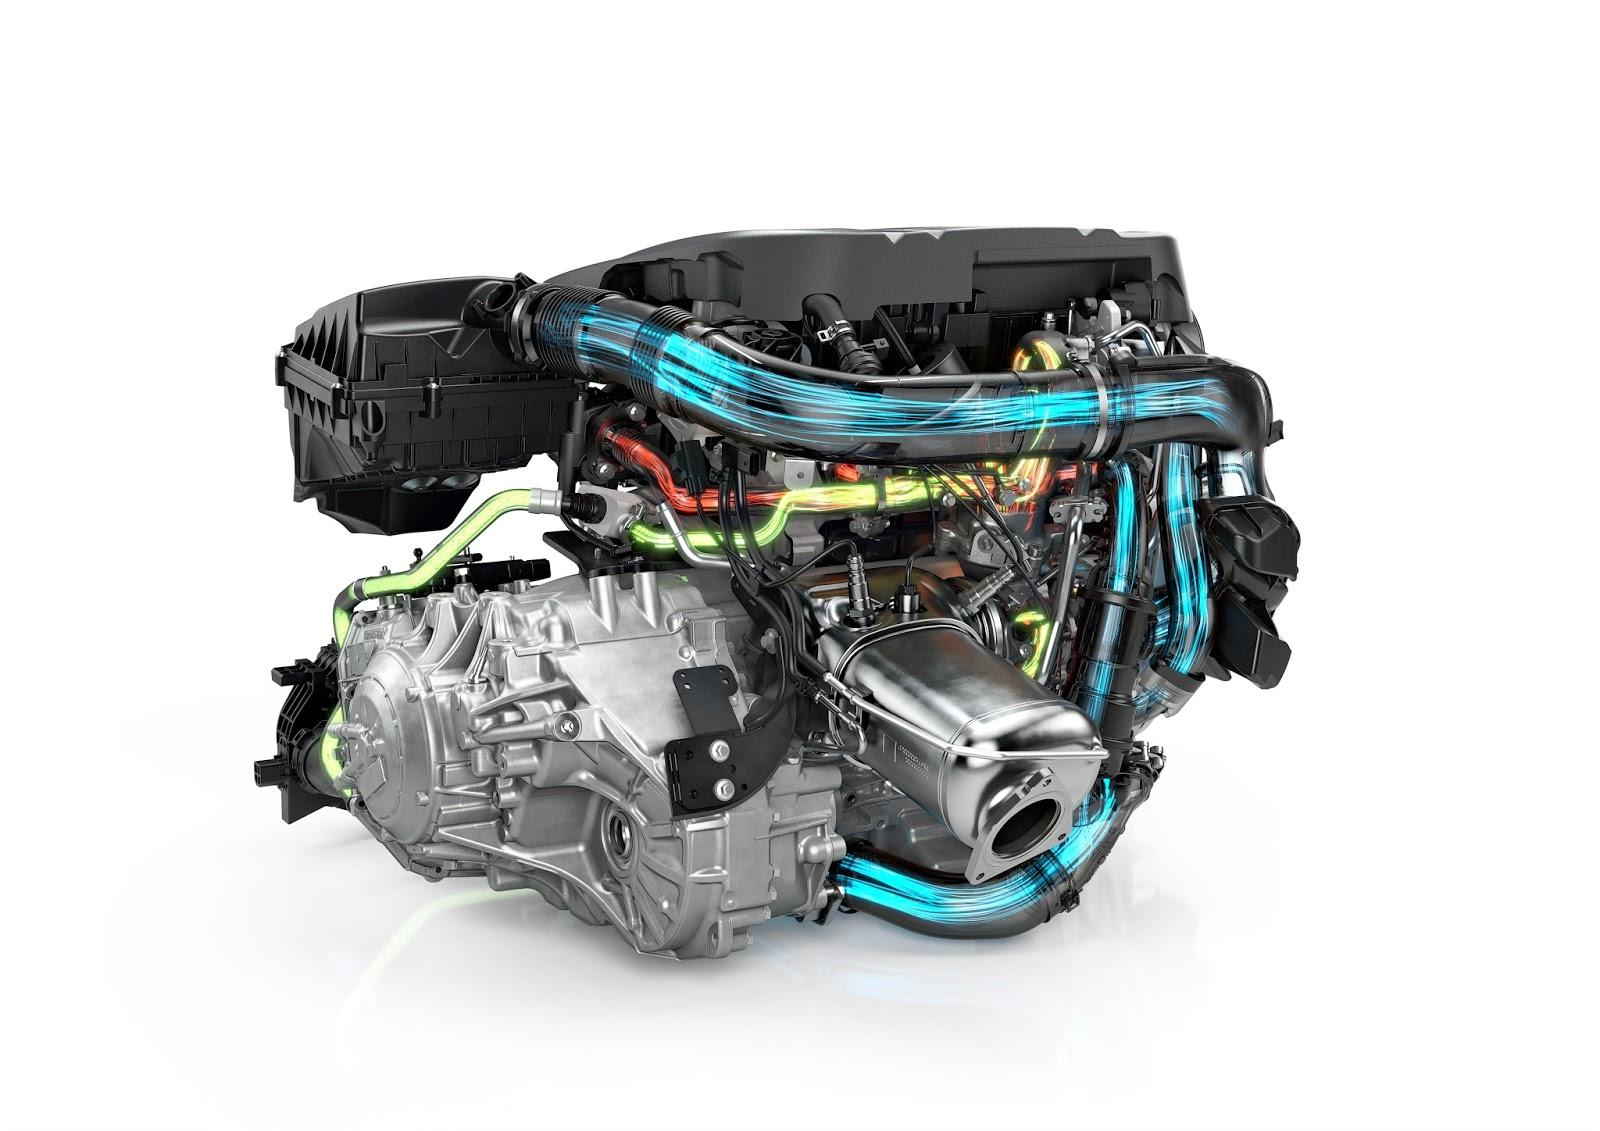 170084 PowerPulse Spool up Το νέο Volvo S90 έρχεται και βάζει φωτιά στον ανταγωνισμό premium sedan, Volvo, Volvo Cars, Volvo S90